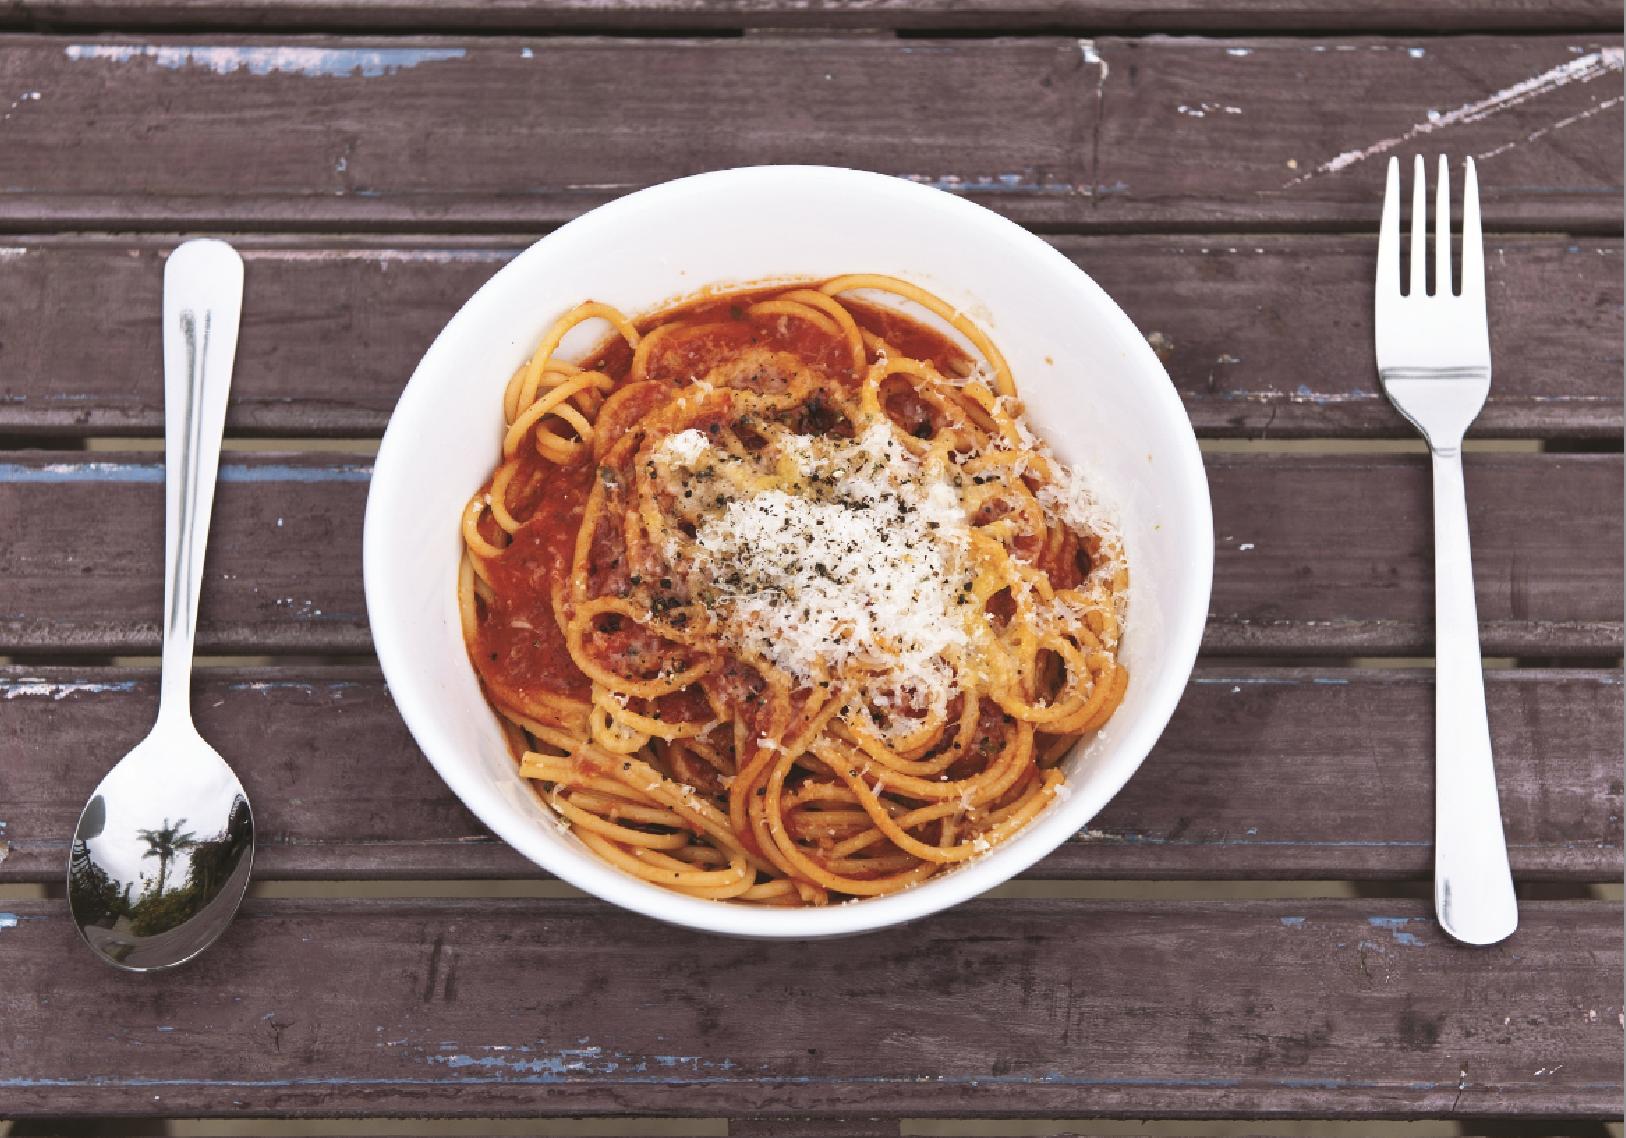 The $4 Spaghetti Recipe That Tastes Almost As Good As The $24 Spaghetti Recipe